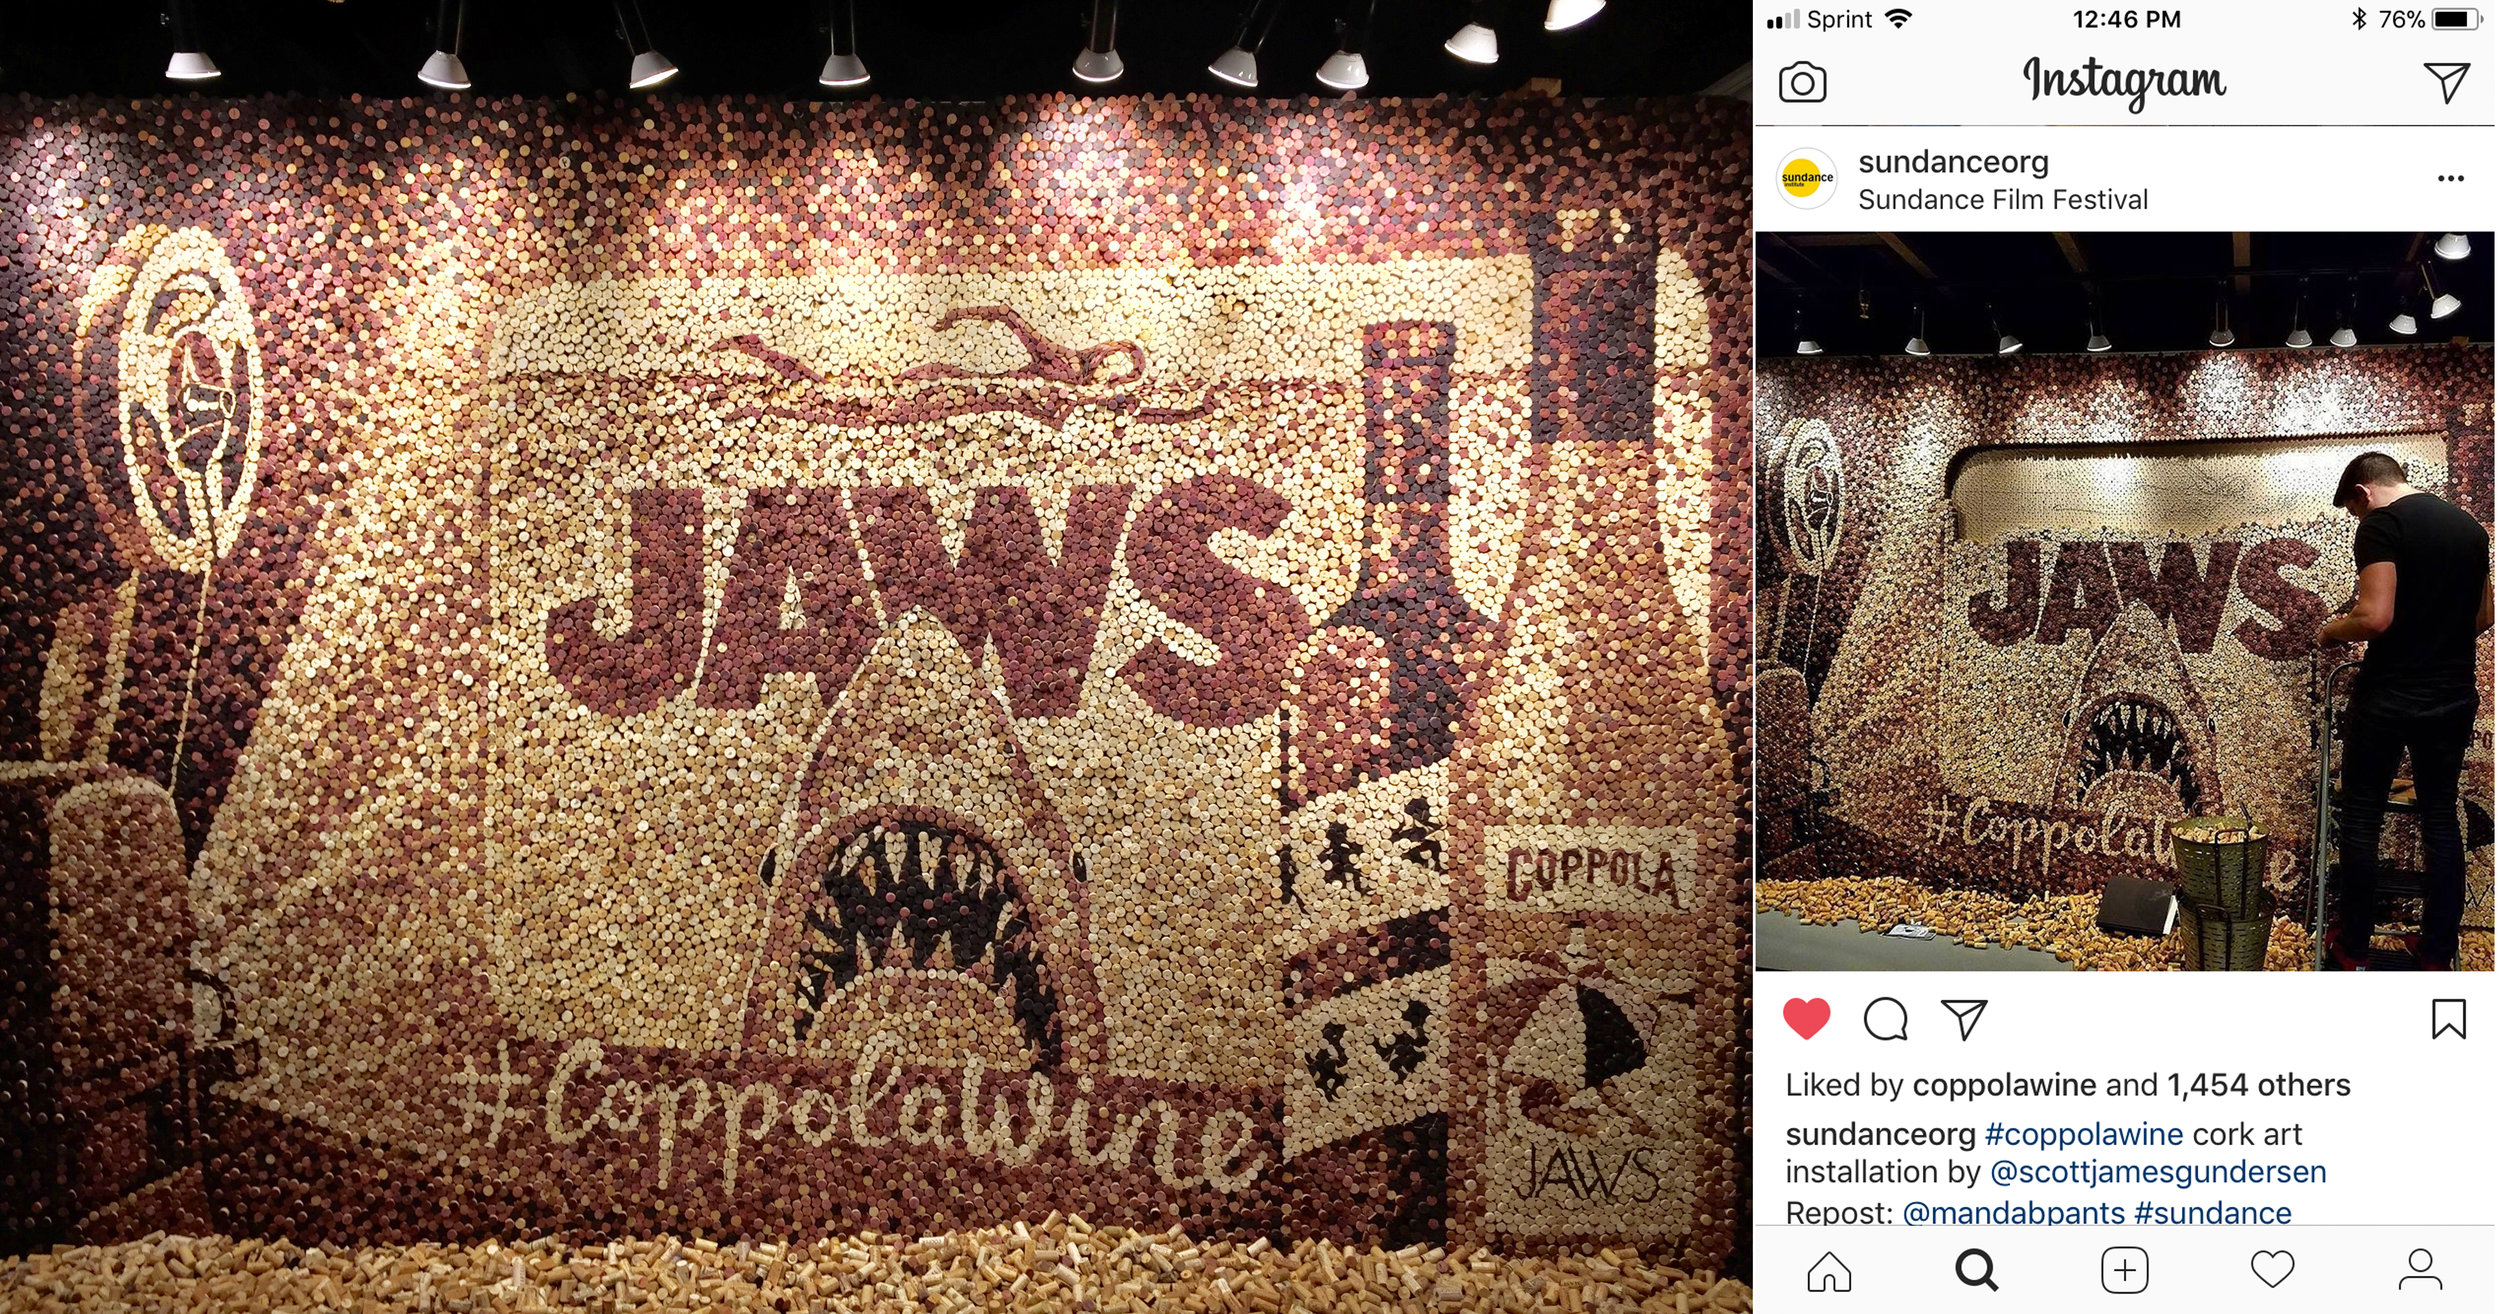 Sundance Coppola Wine Activation.jpg